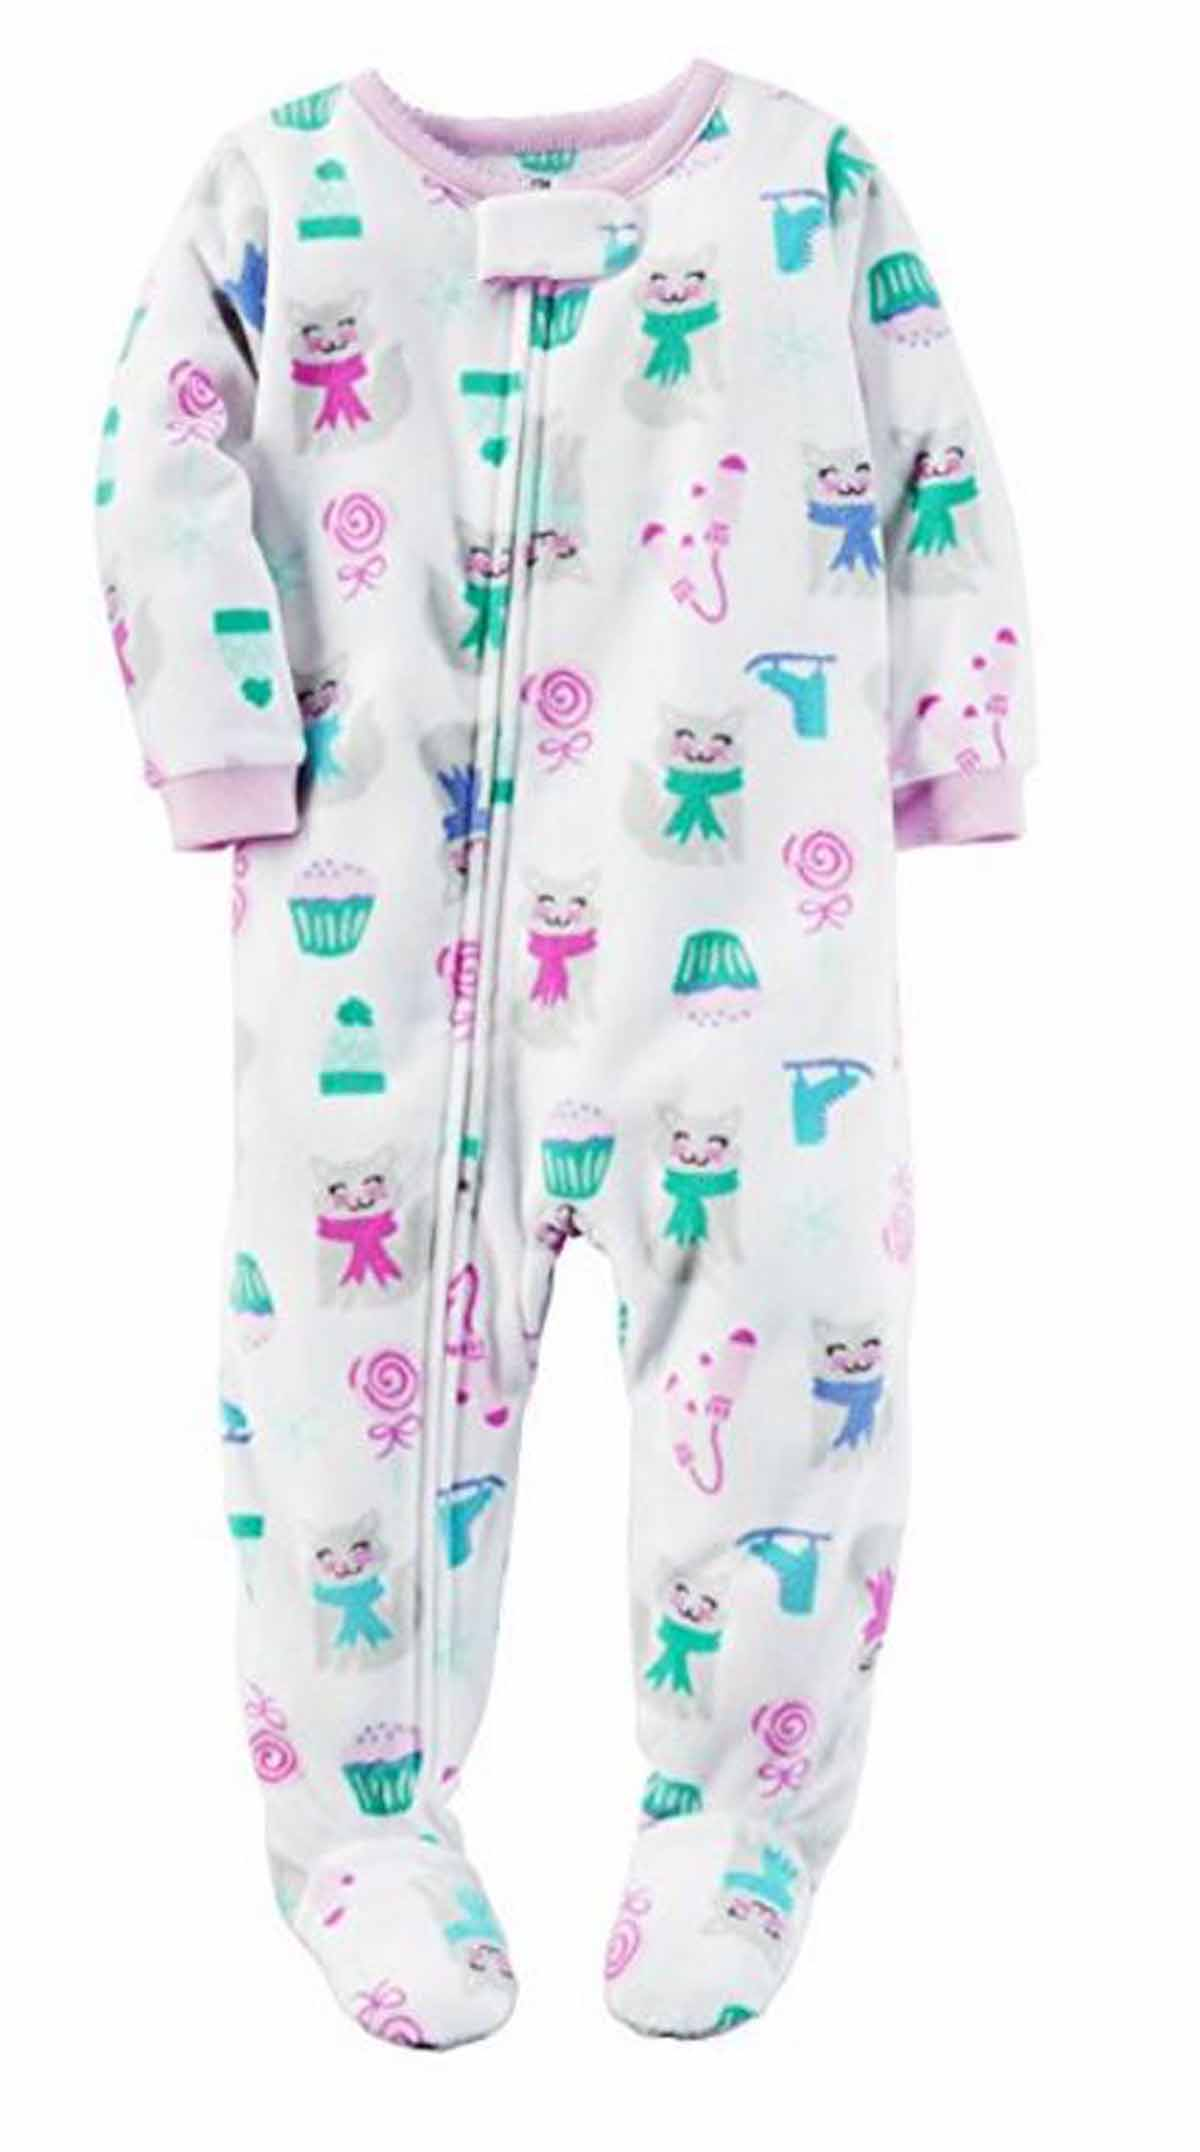 5ad6721e5f Carters Girls 1 Piece Footed Sleeper Zip Up Fleece Pajama